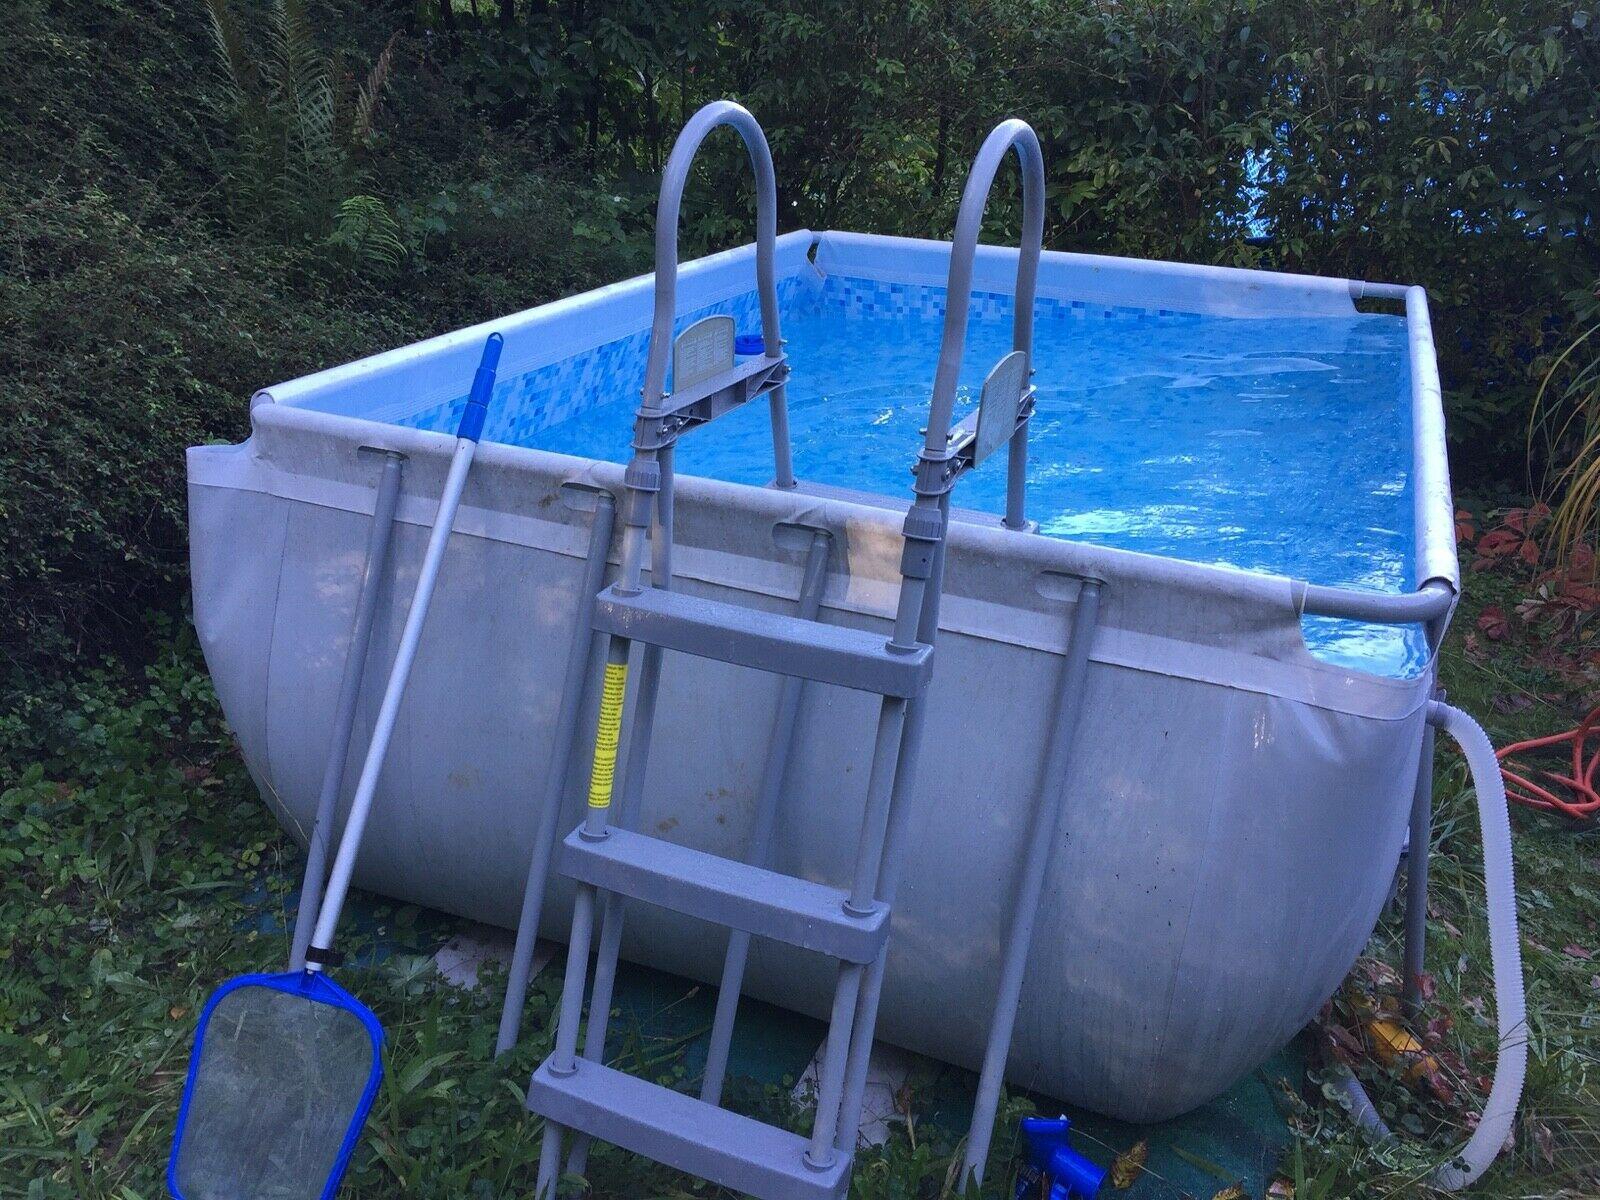 Full Size of Gartenpool Rechteckig Bestway 56409 Frame Pool Power Steel Set Wohnzimmer Gartenpool Rechteckig